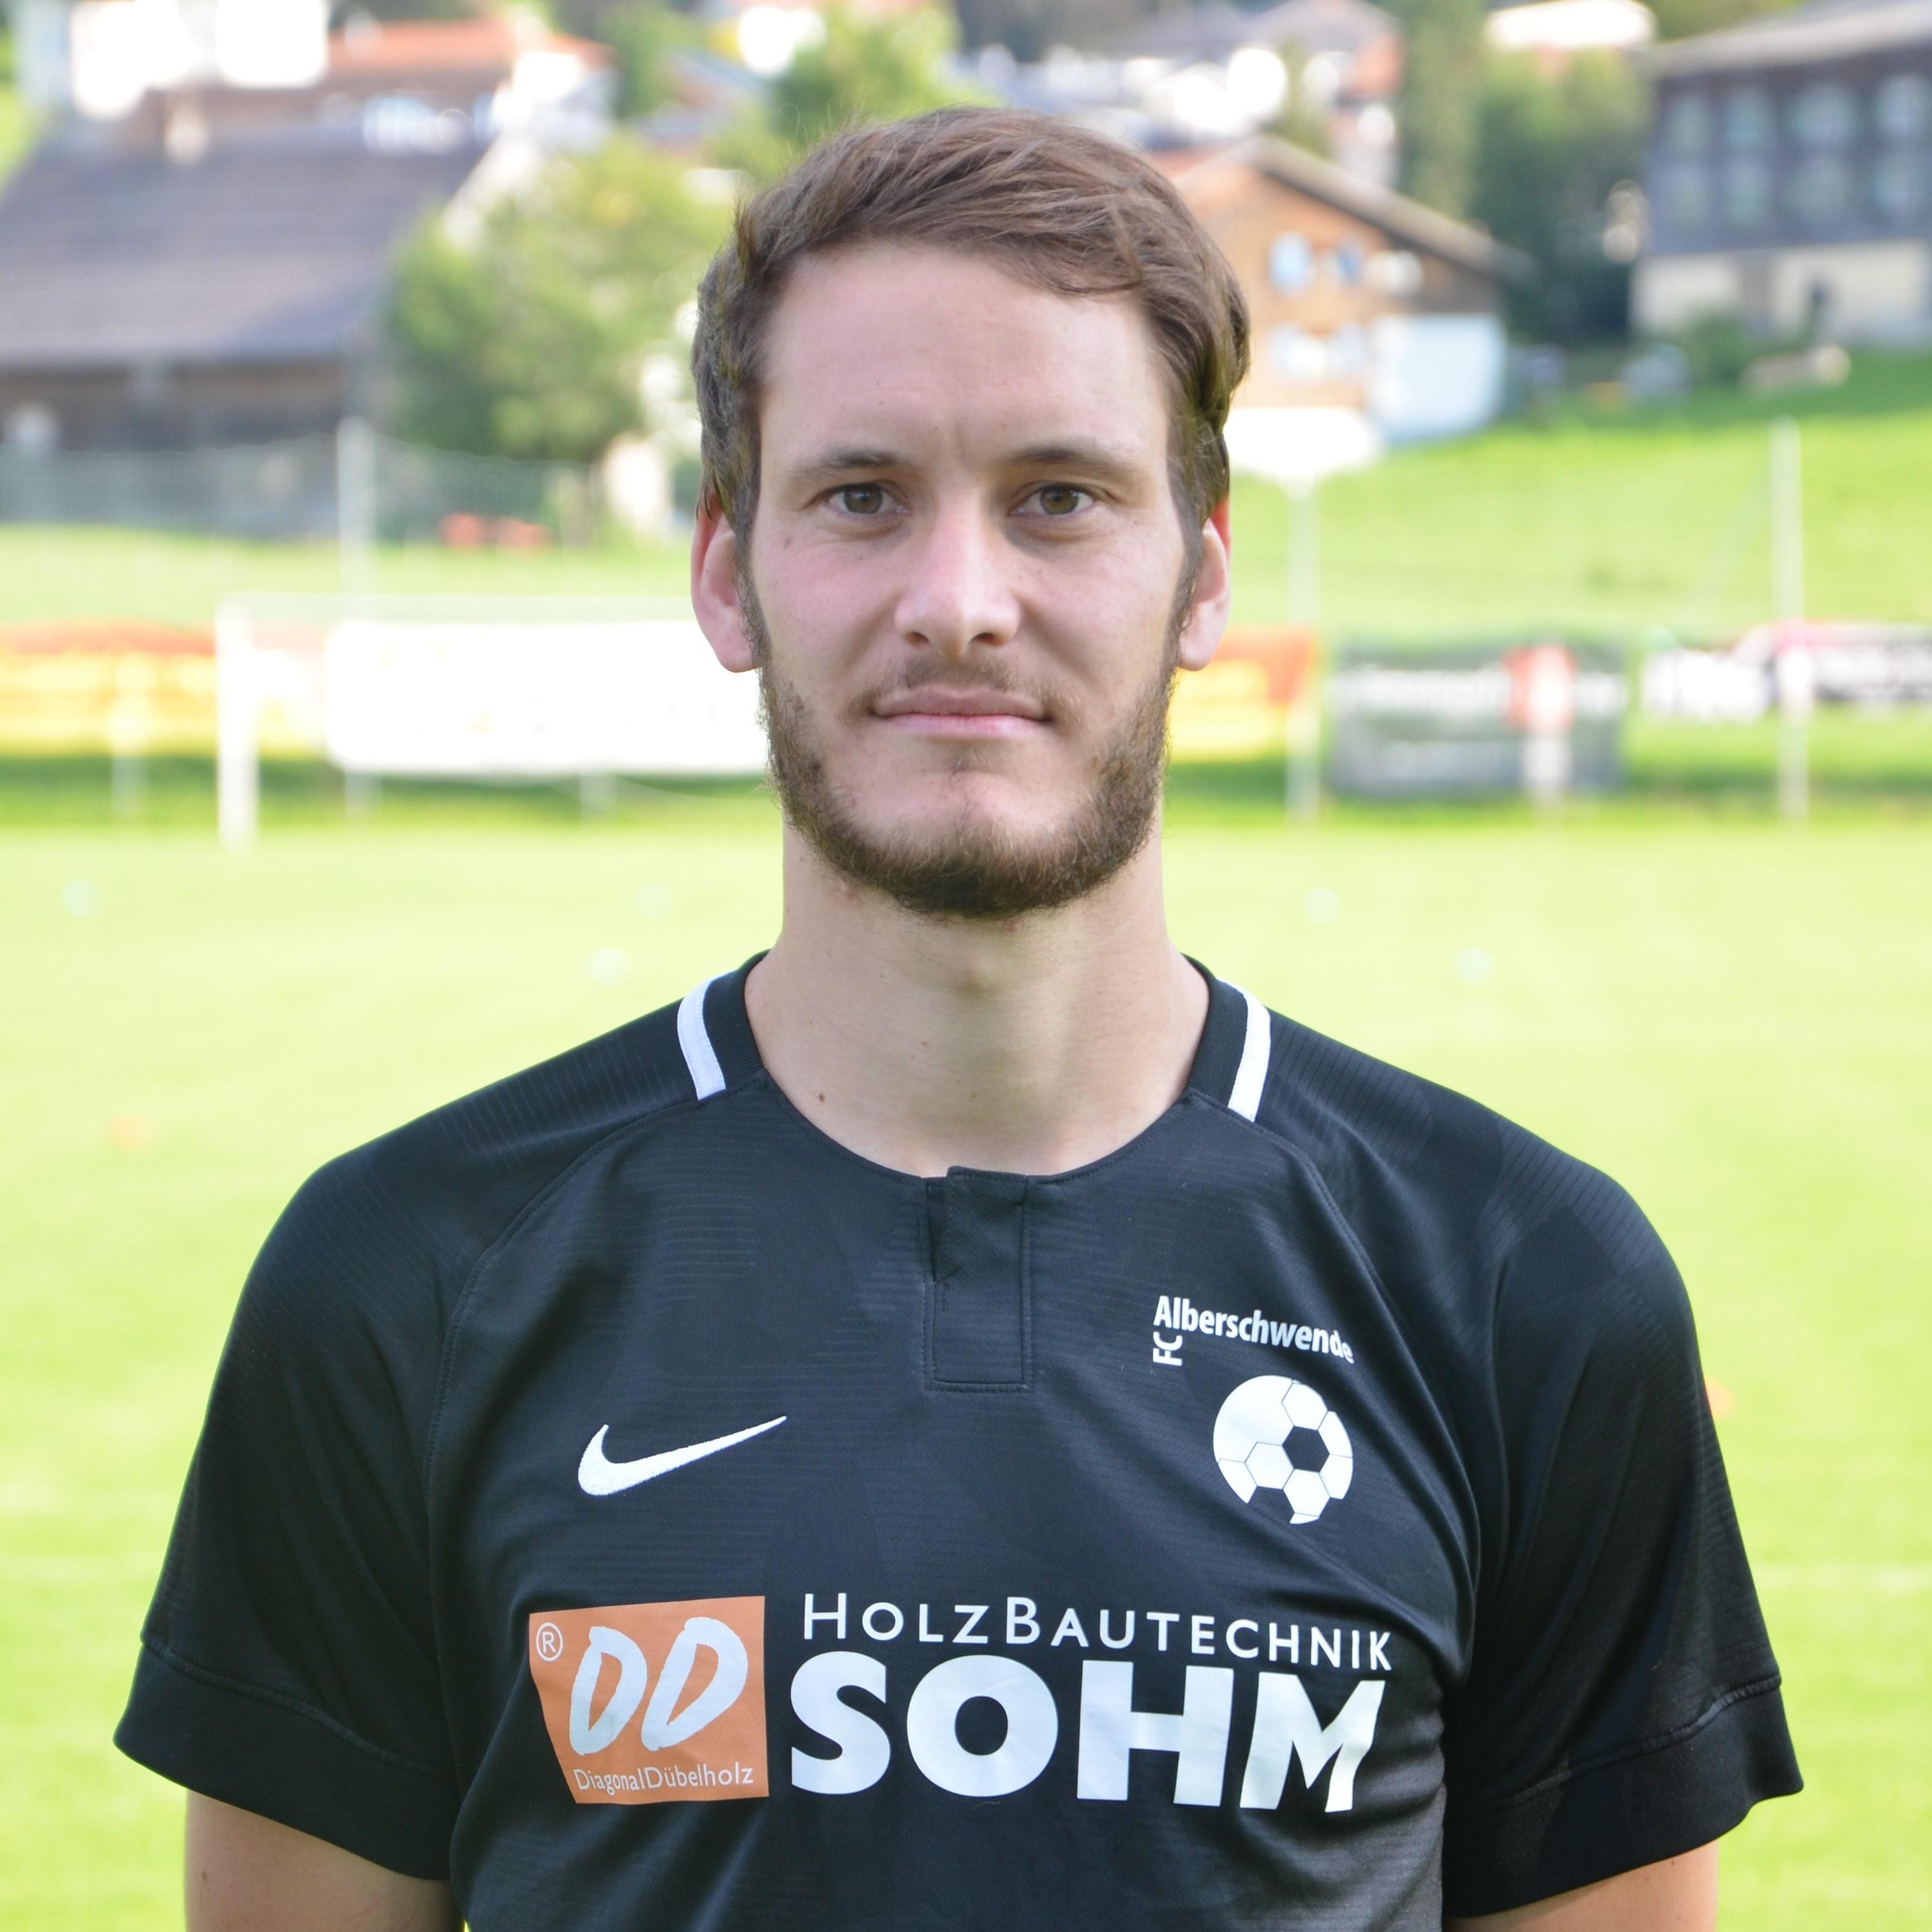 Kilian Sohm